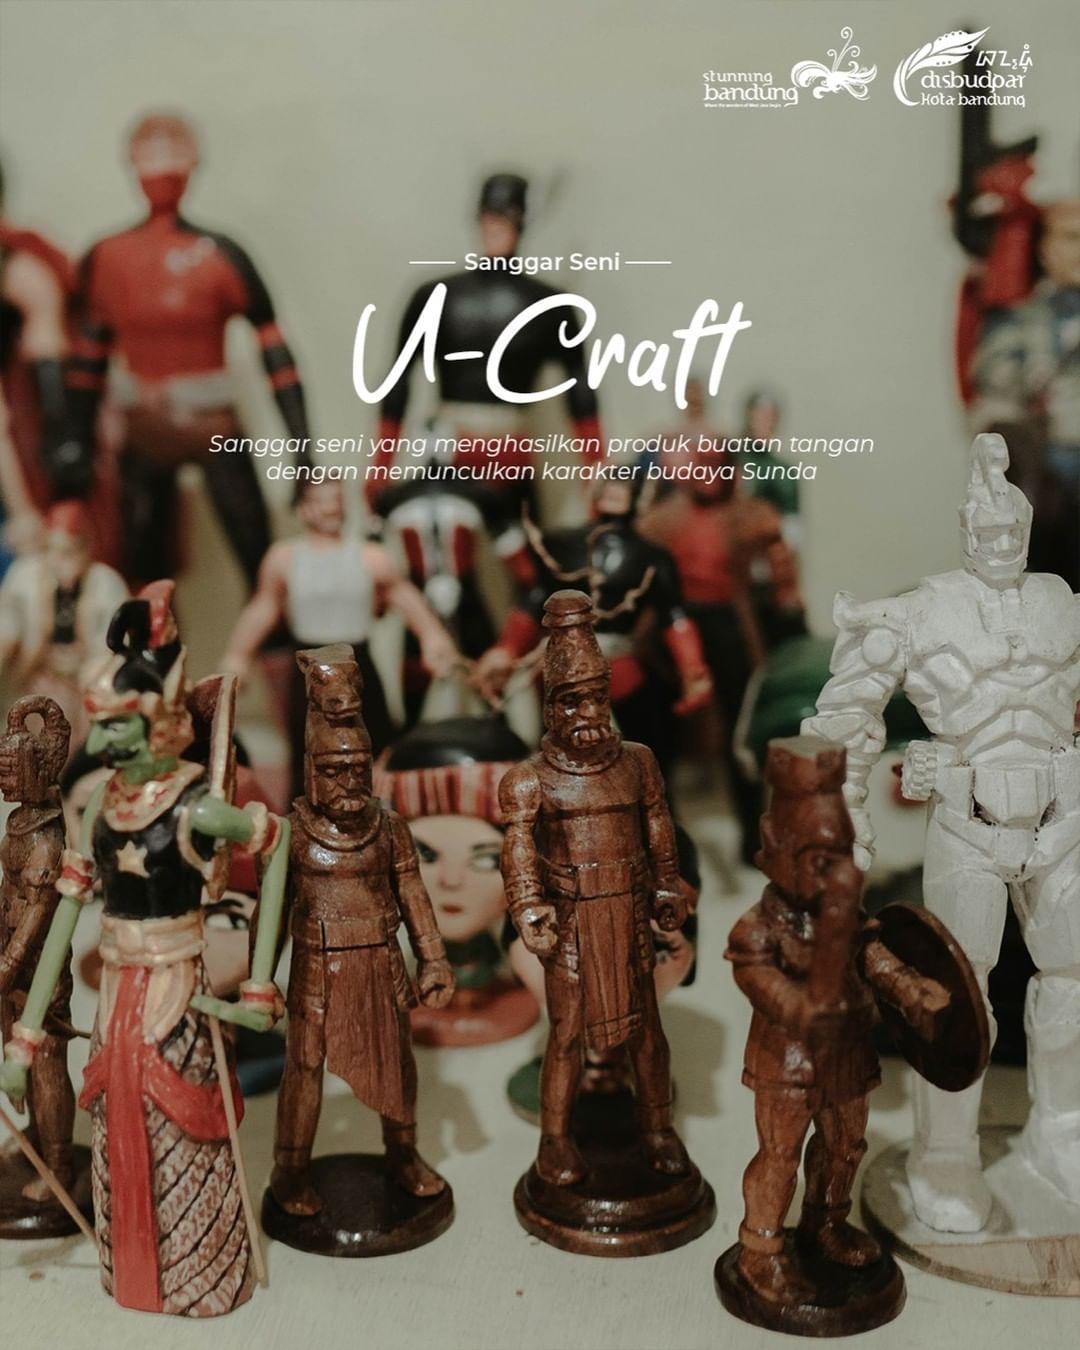 Sanggar Seni Ukir dan Lukis Ucraft dalam Pelestarian Budaya Sunda